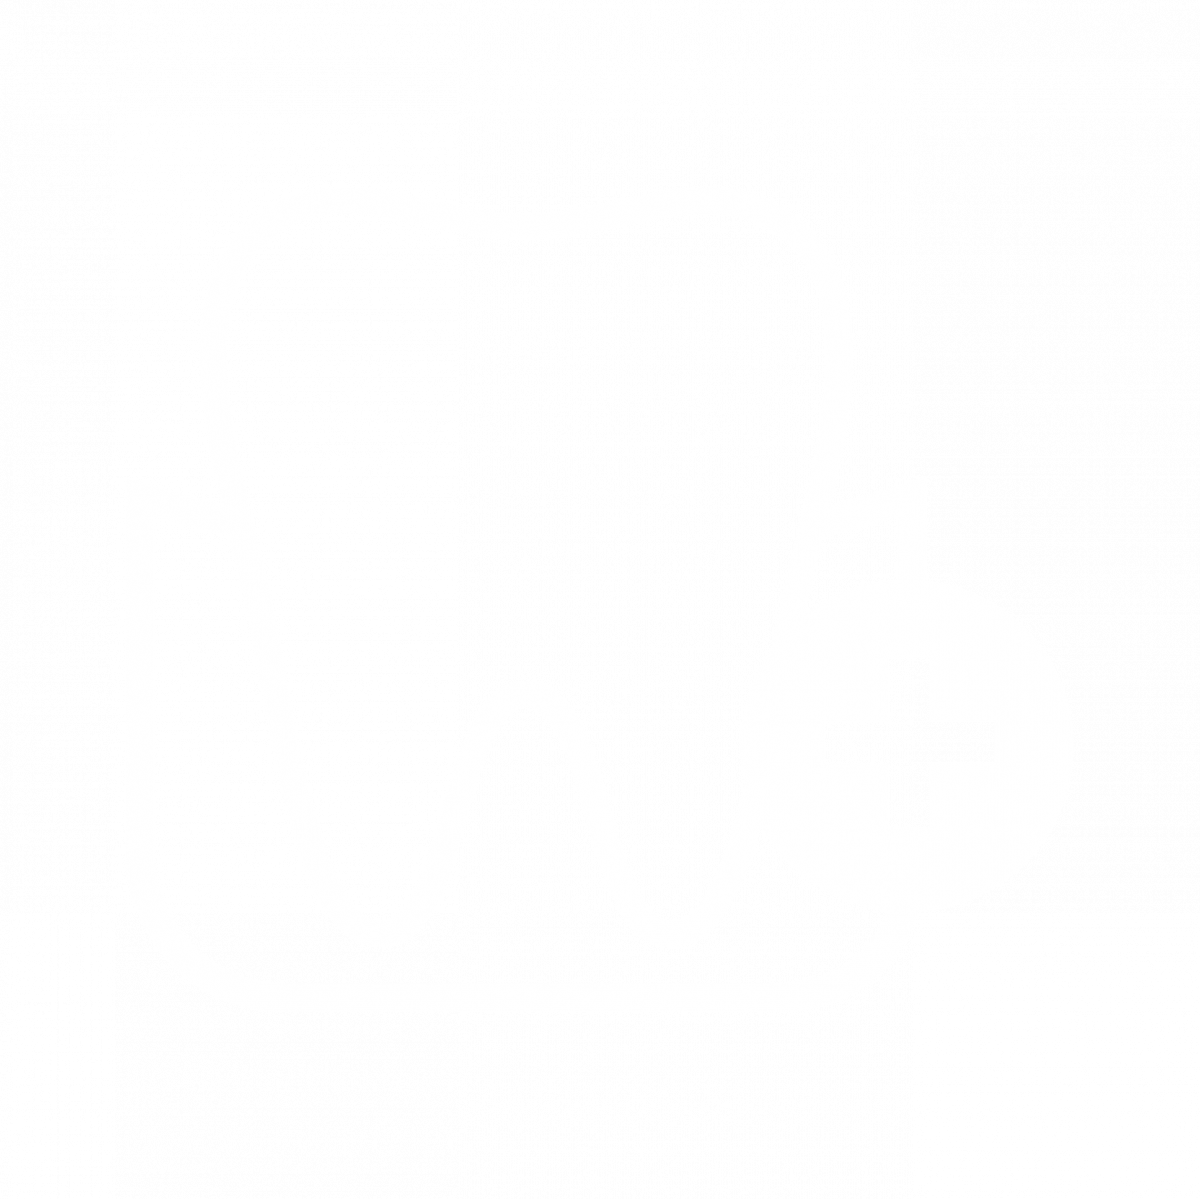 Bothwell Advicecare Denture Repair